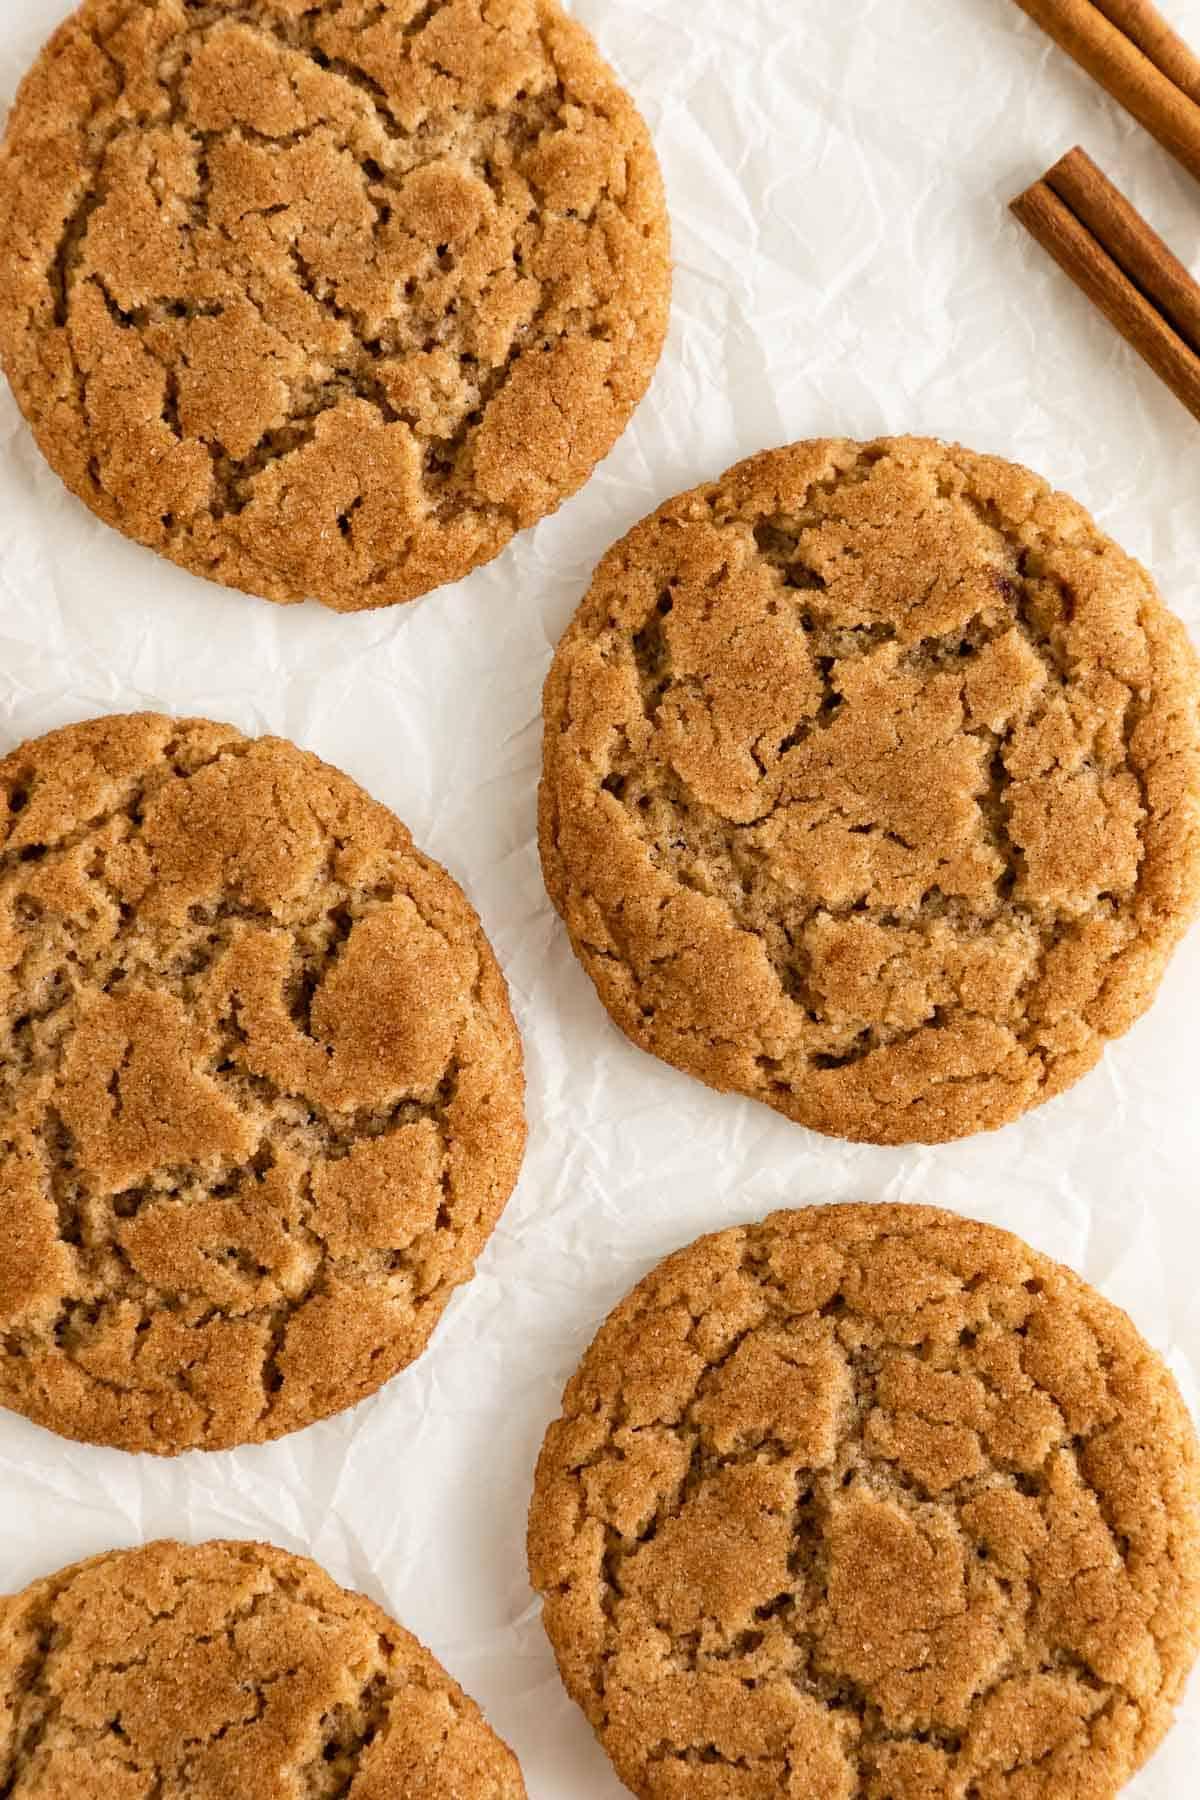 an overhead photo of five vegan snickerdoodle cookies beside two cinnamon sticks